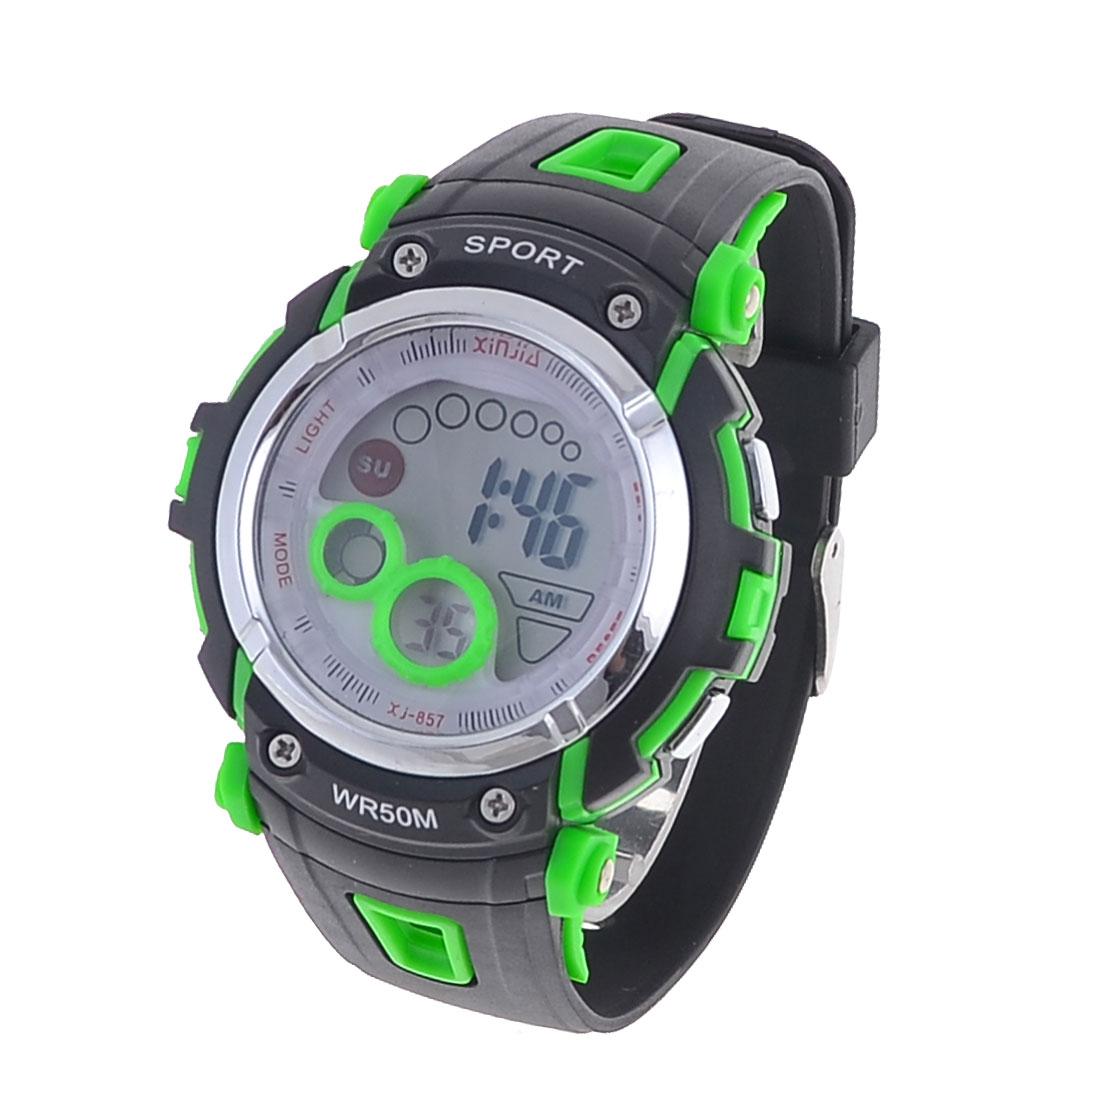 Men Adjustable Watchband Backlight Alarm Digital Sports Watch Black Green